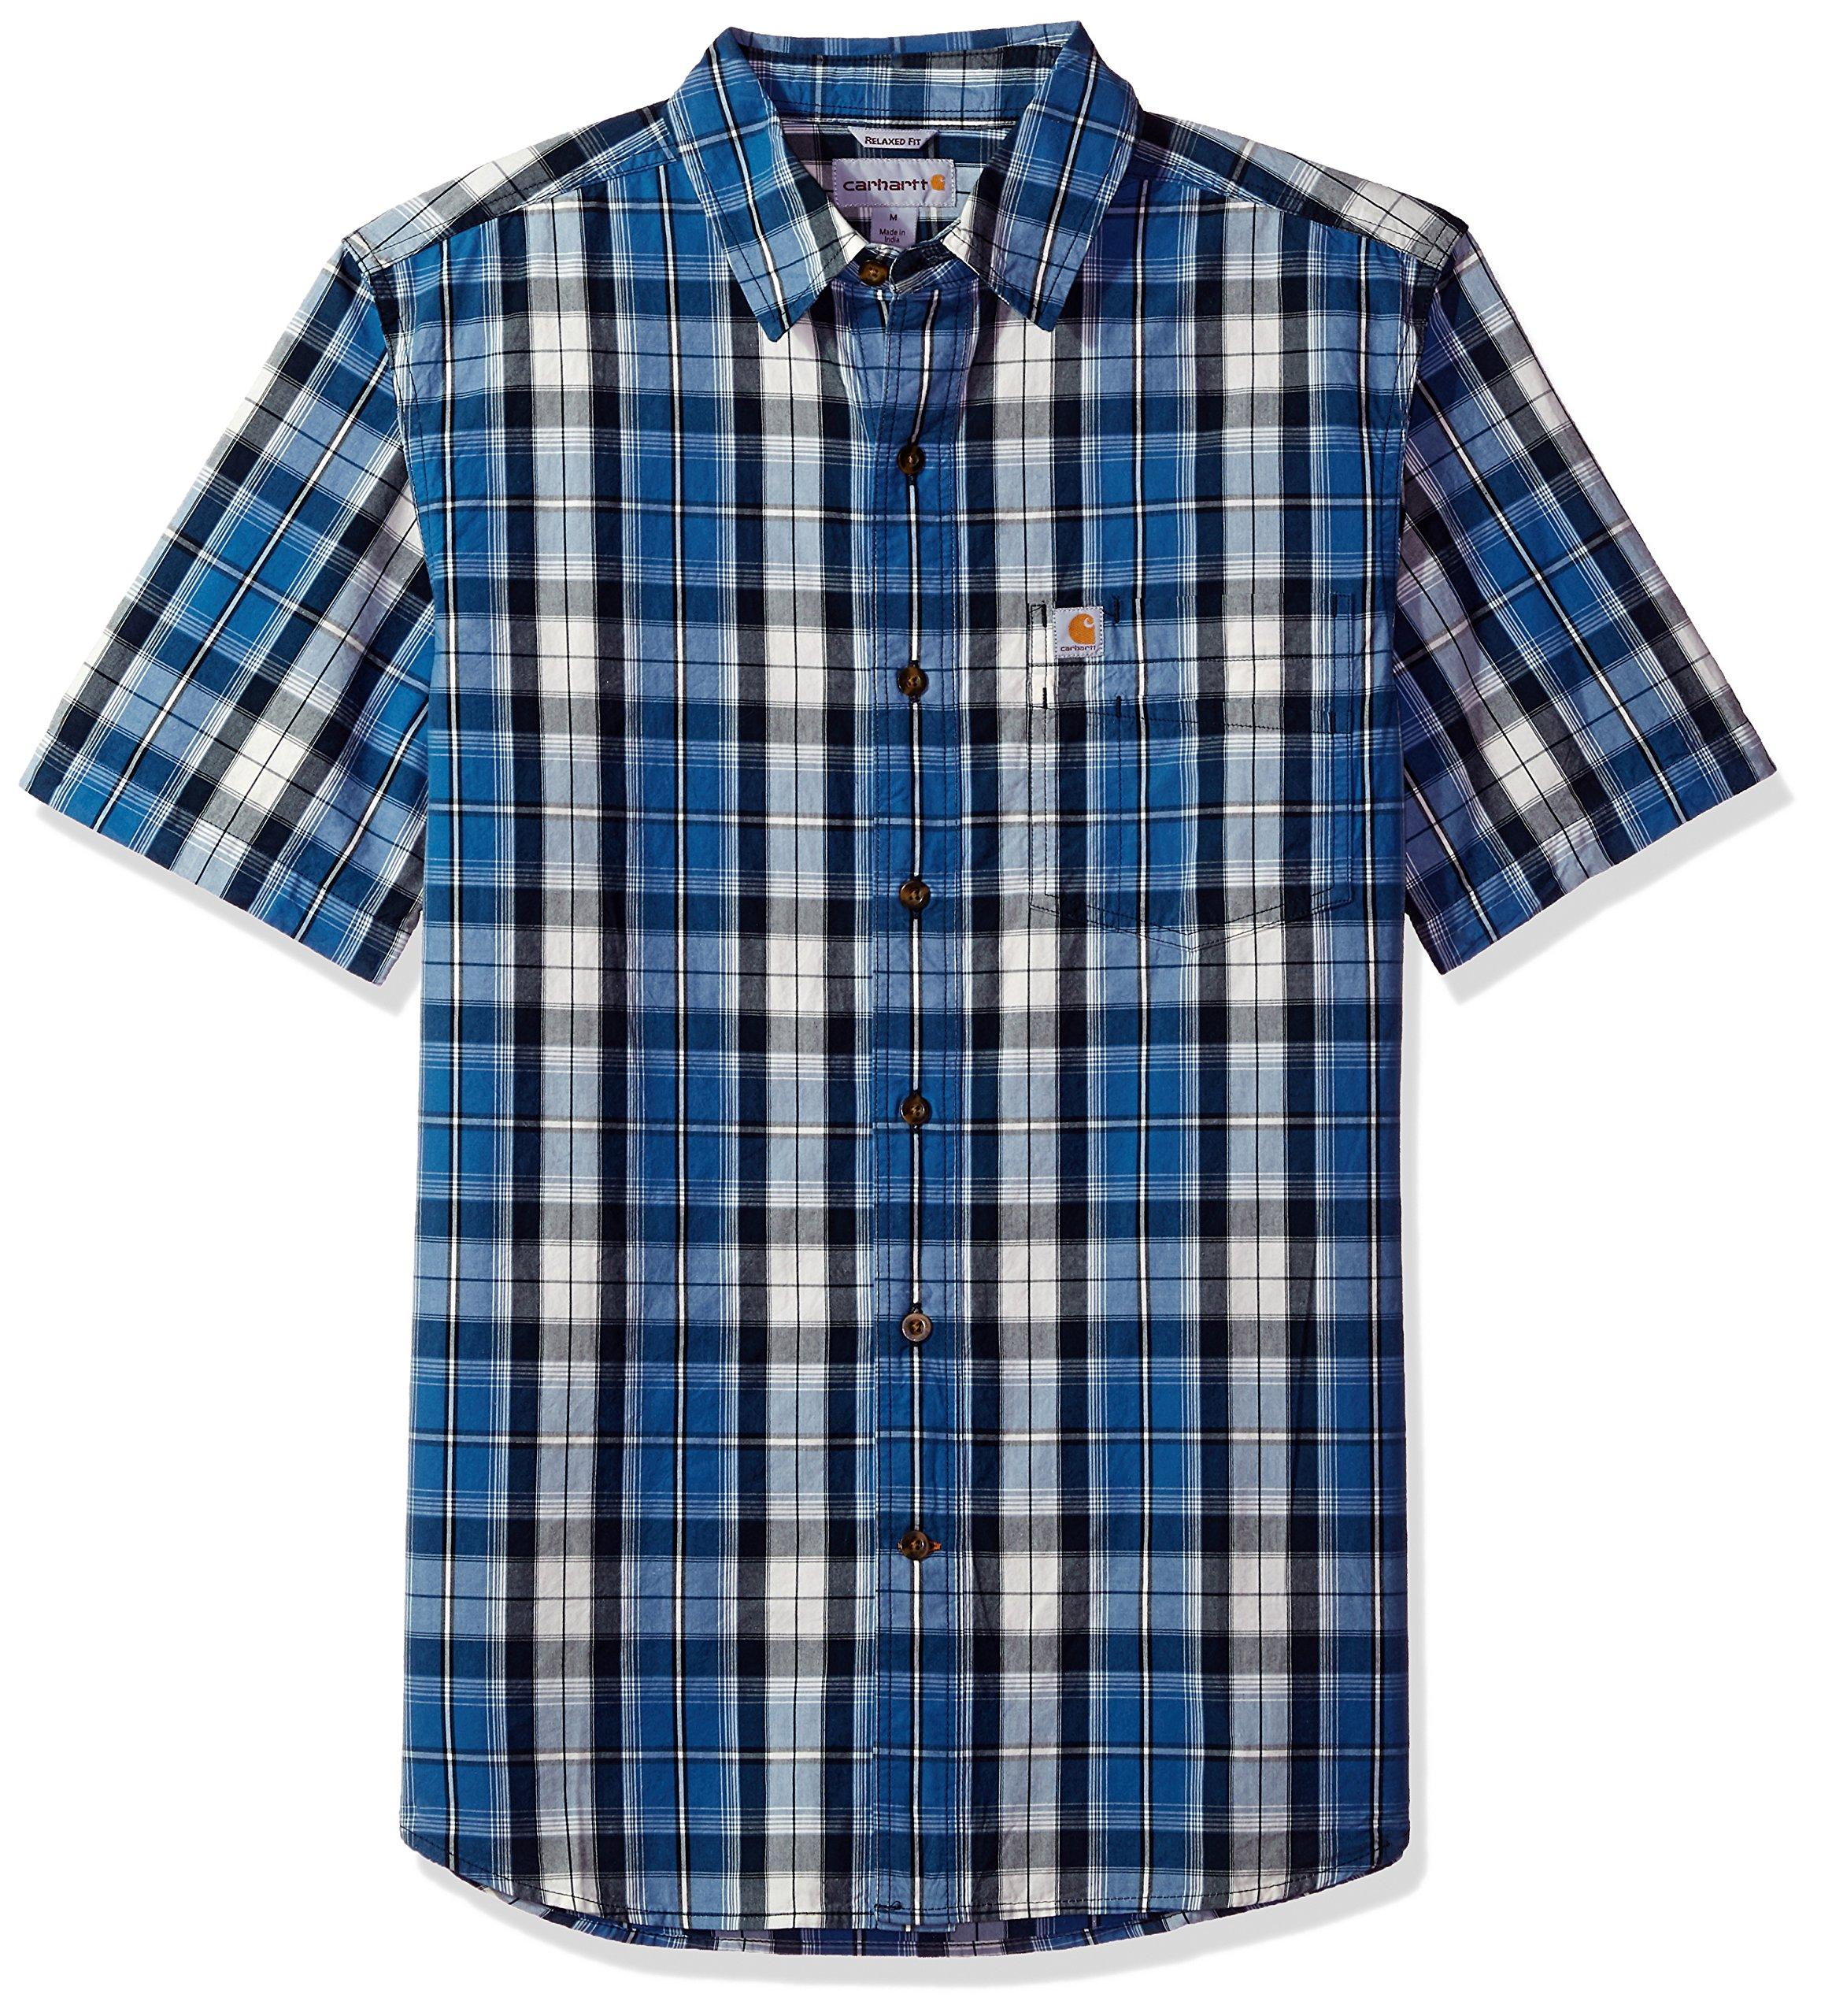 Carhartt Men's Essential Plaid Open Collar Short Sleeve Shirt, Federal Blue, X-Large